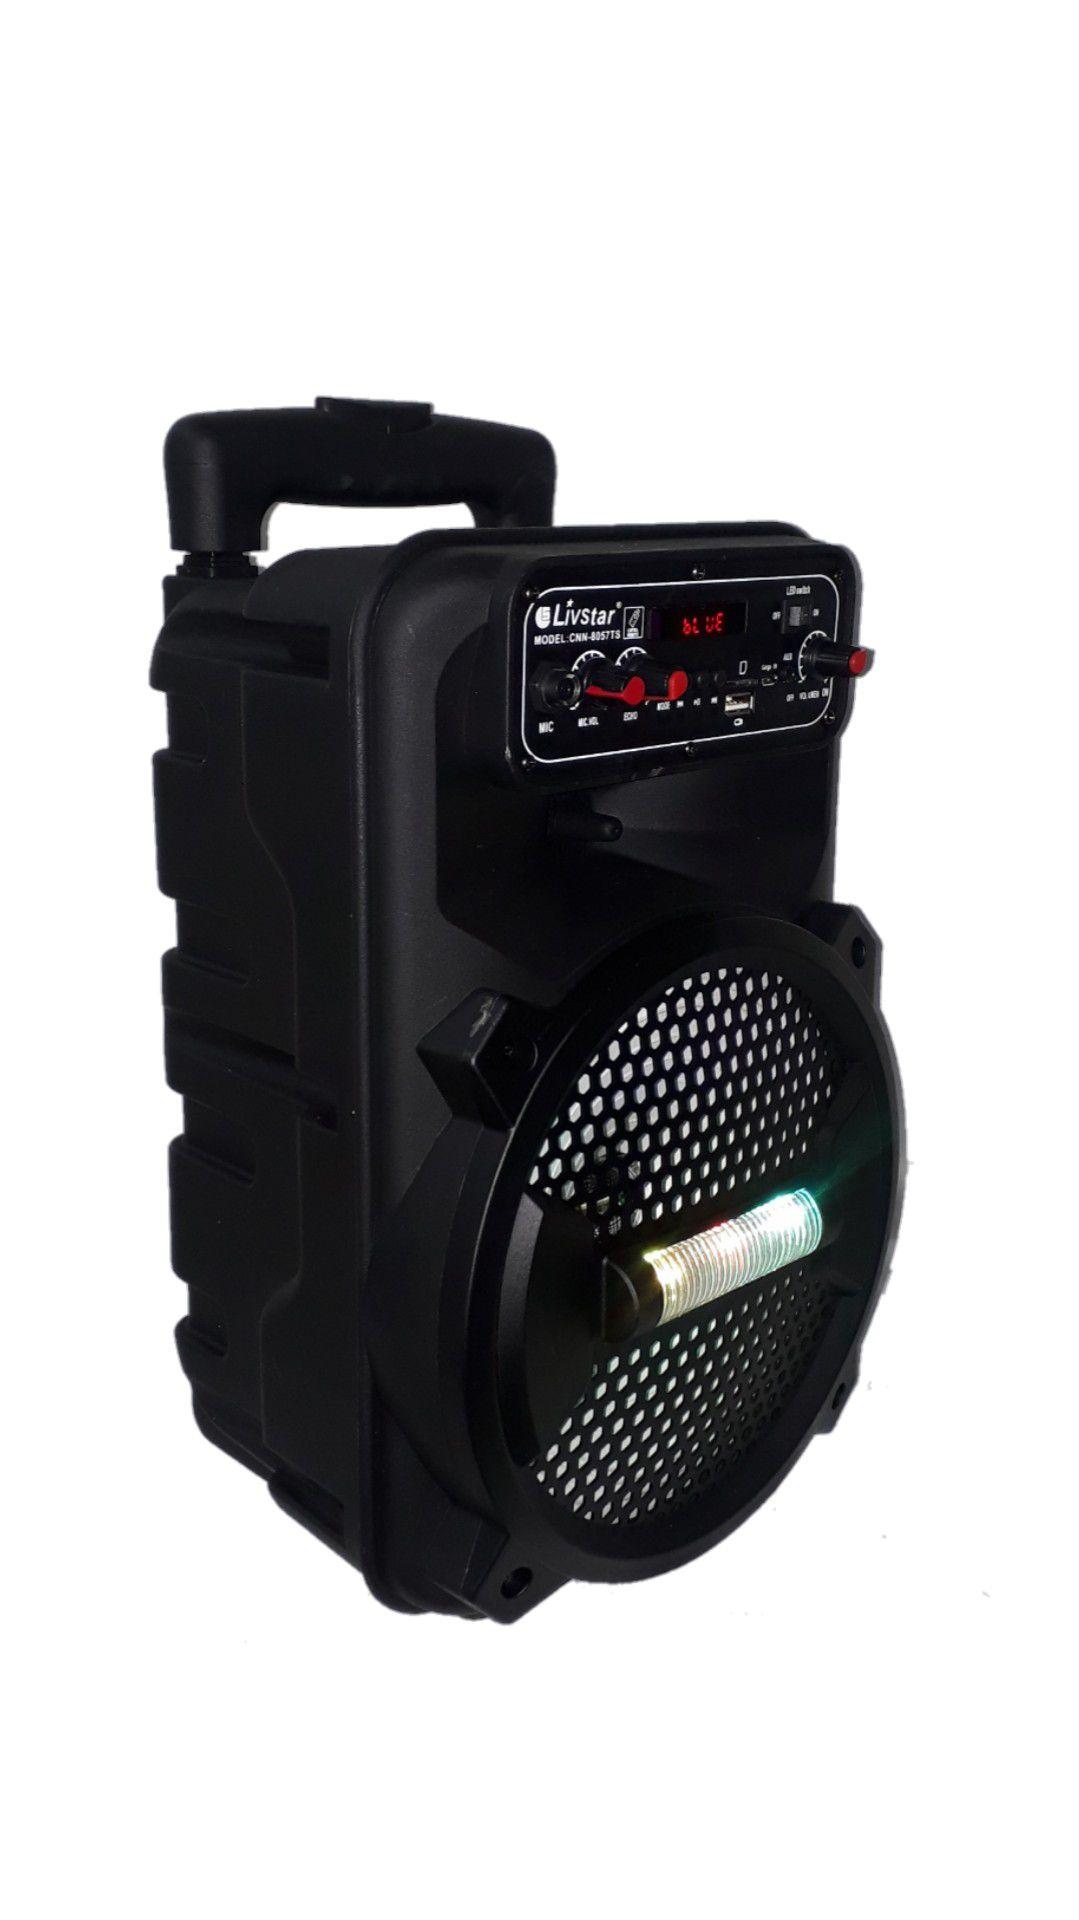 Caixa Amplificada Livstar CNN8012TS BLUE.USB/SD/FM/ 1MICROFONE C/ FIO